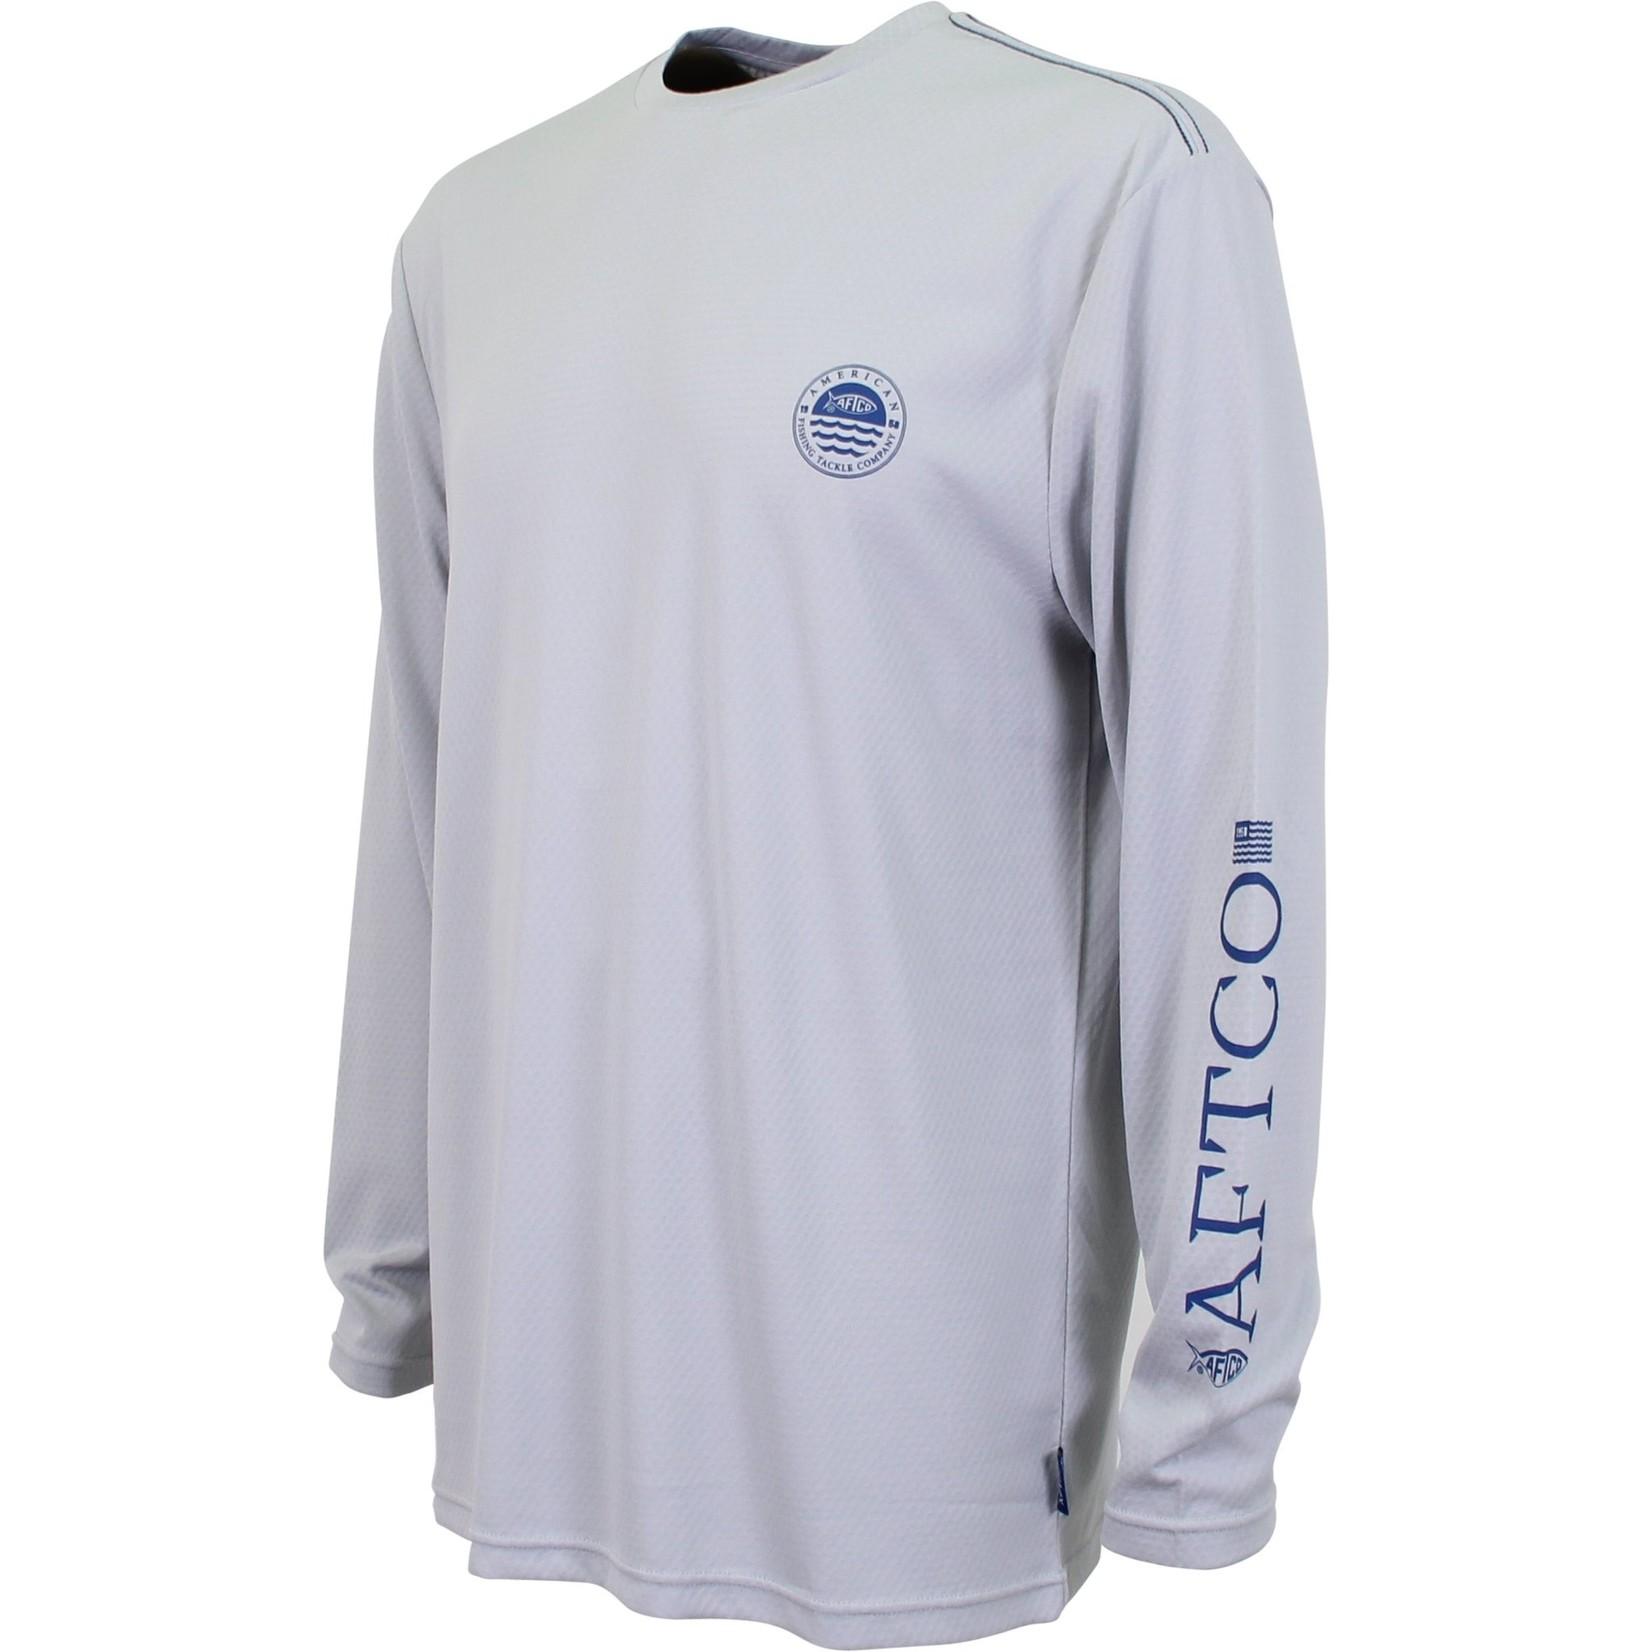 AFTCO AFTCO Frontline LS Shirt